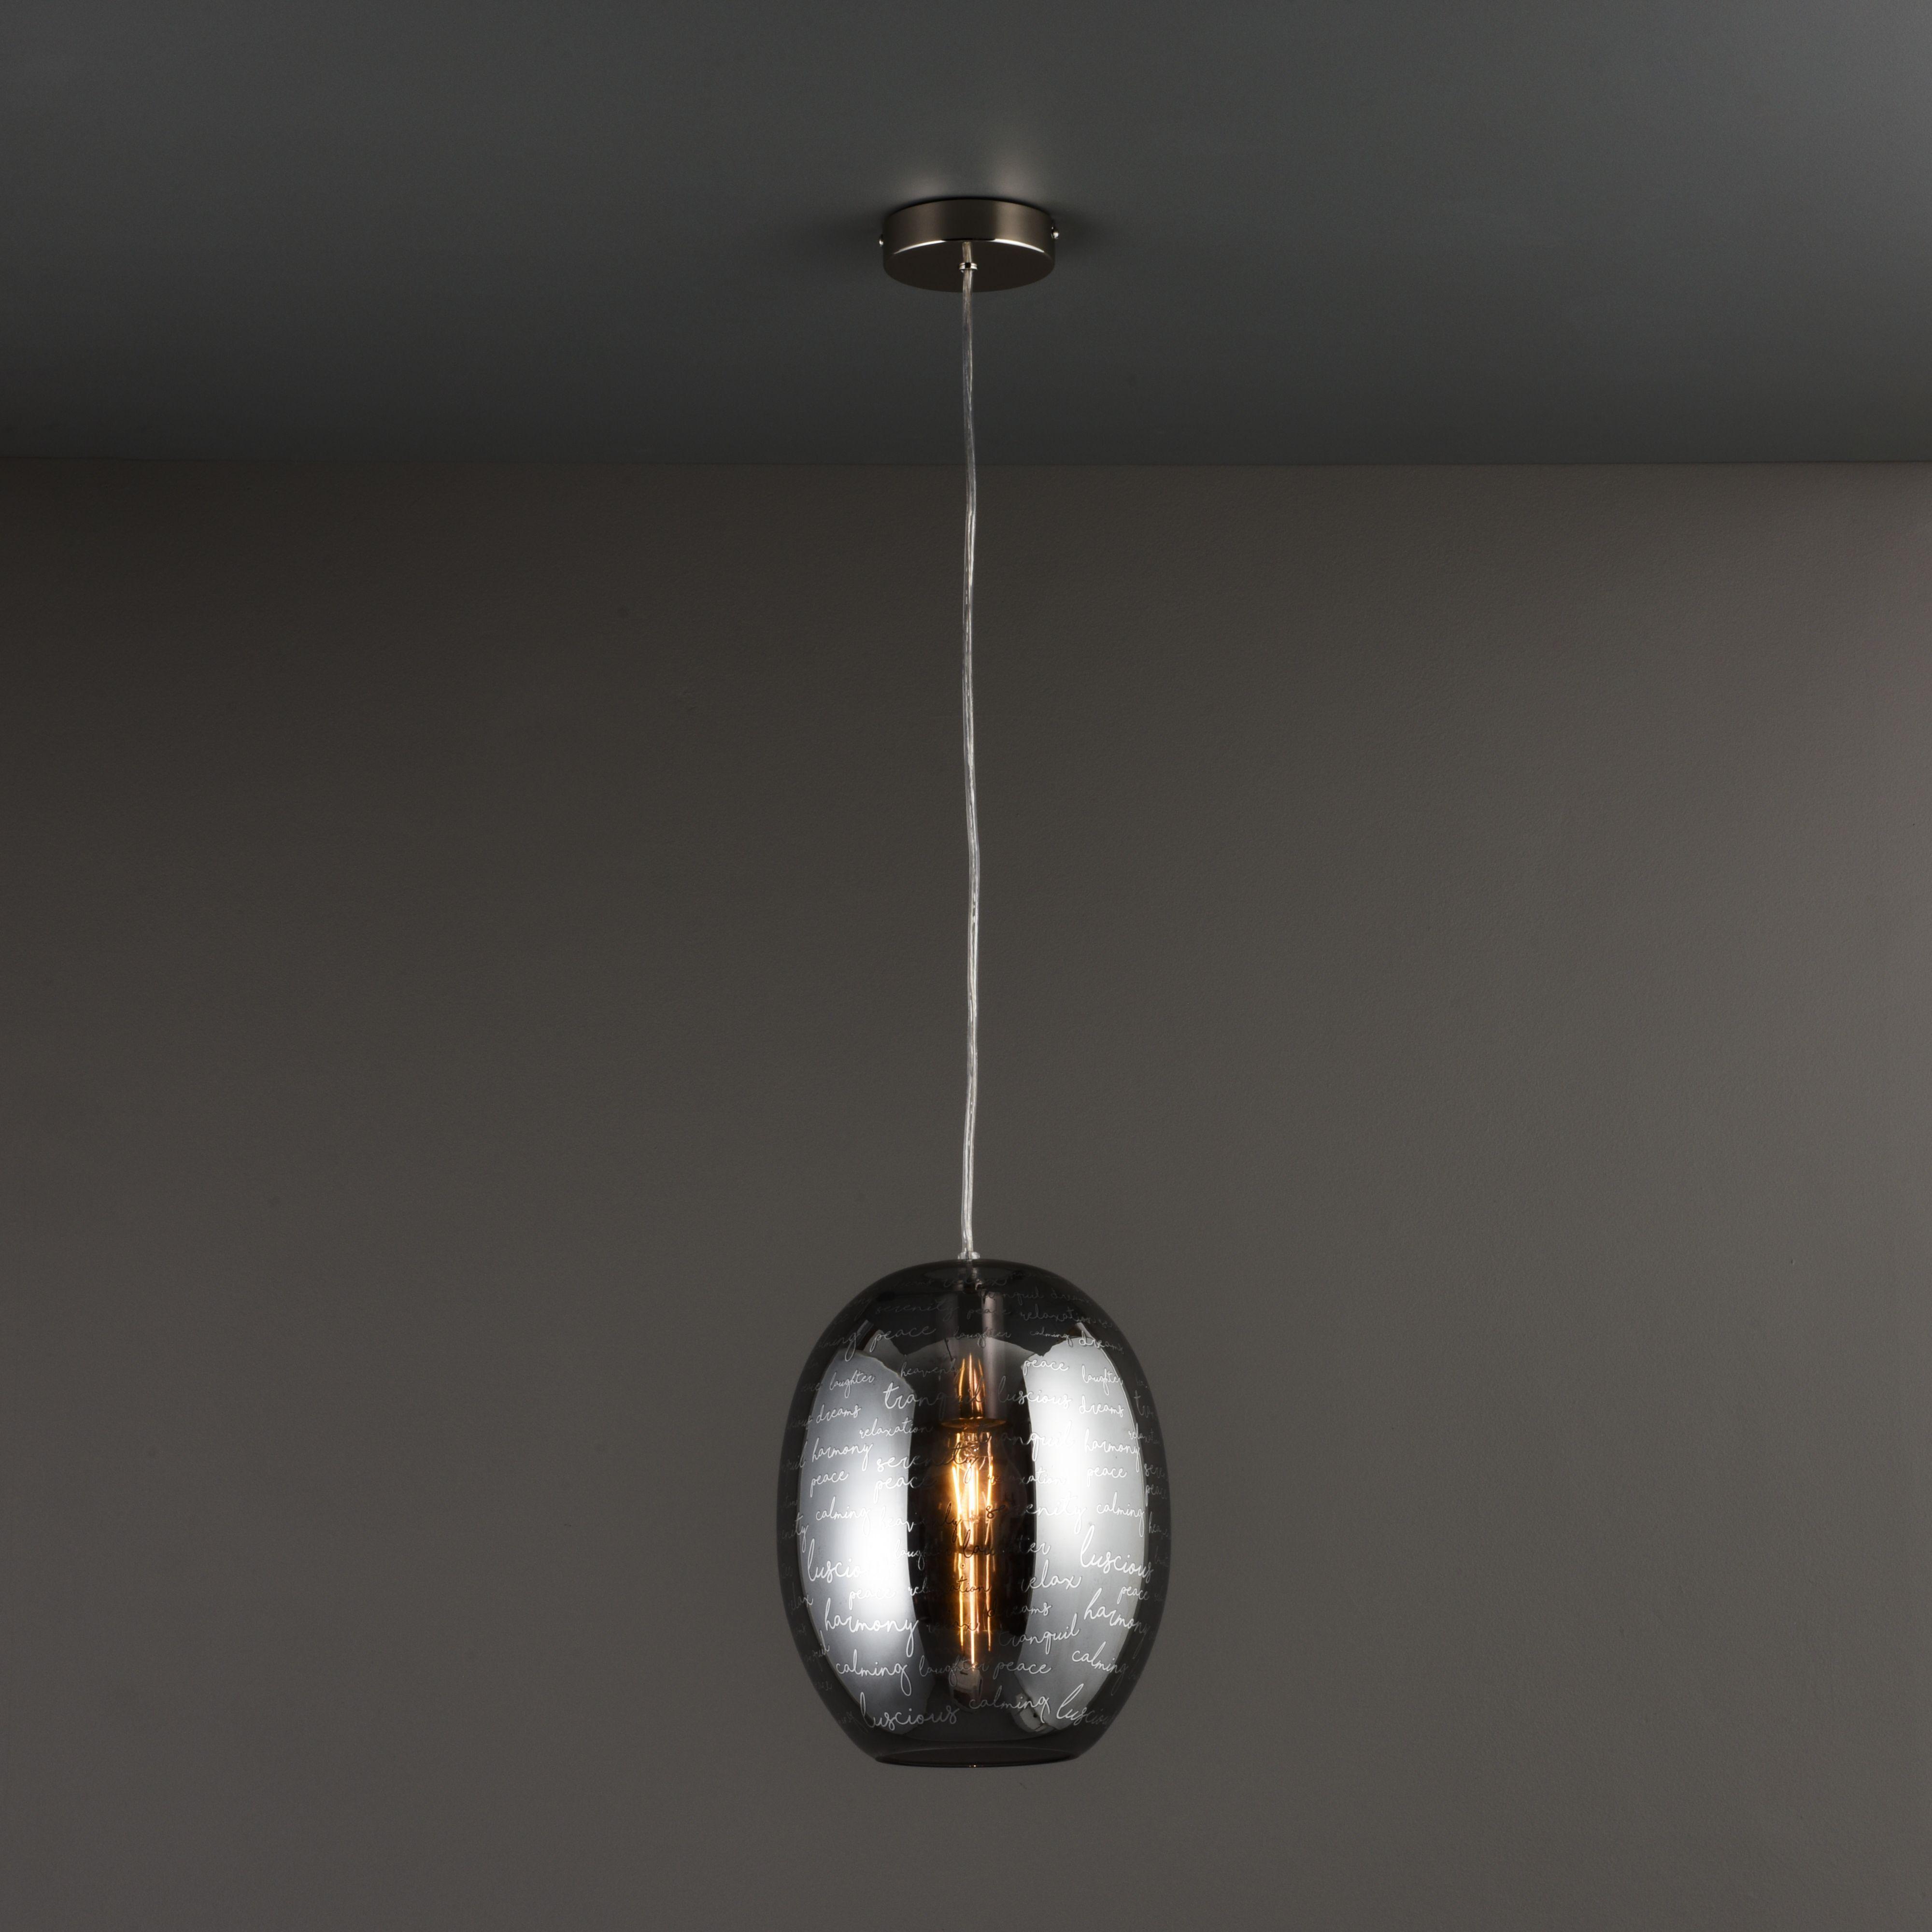 Jenessa Modern Satin Nickel Effect Ceiling Light